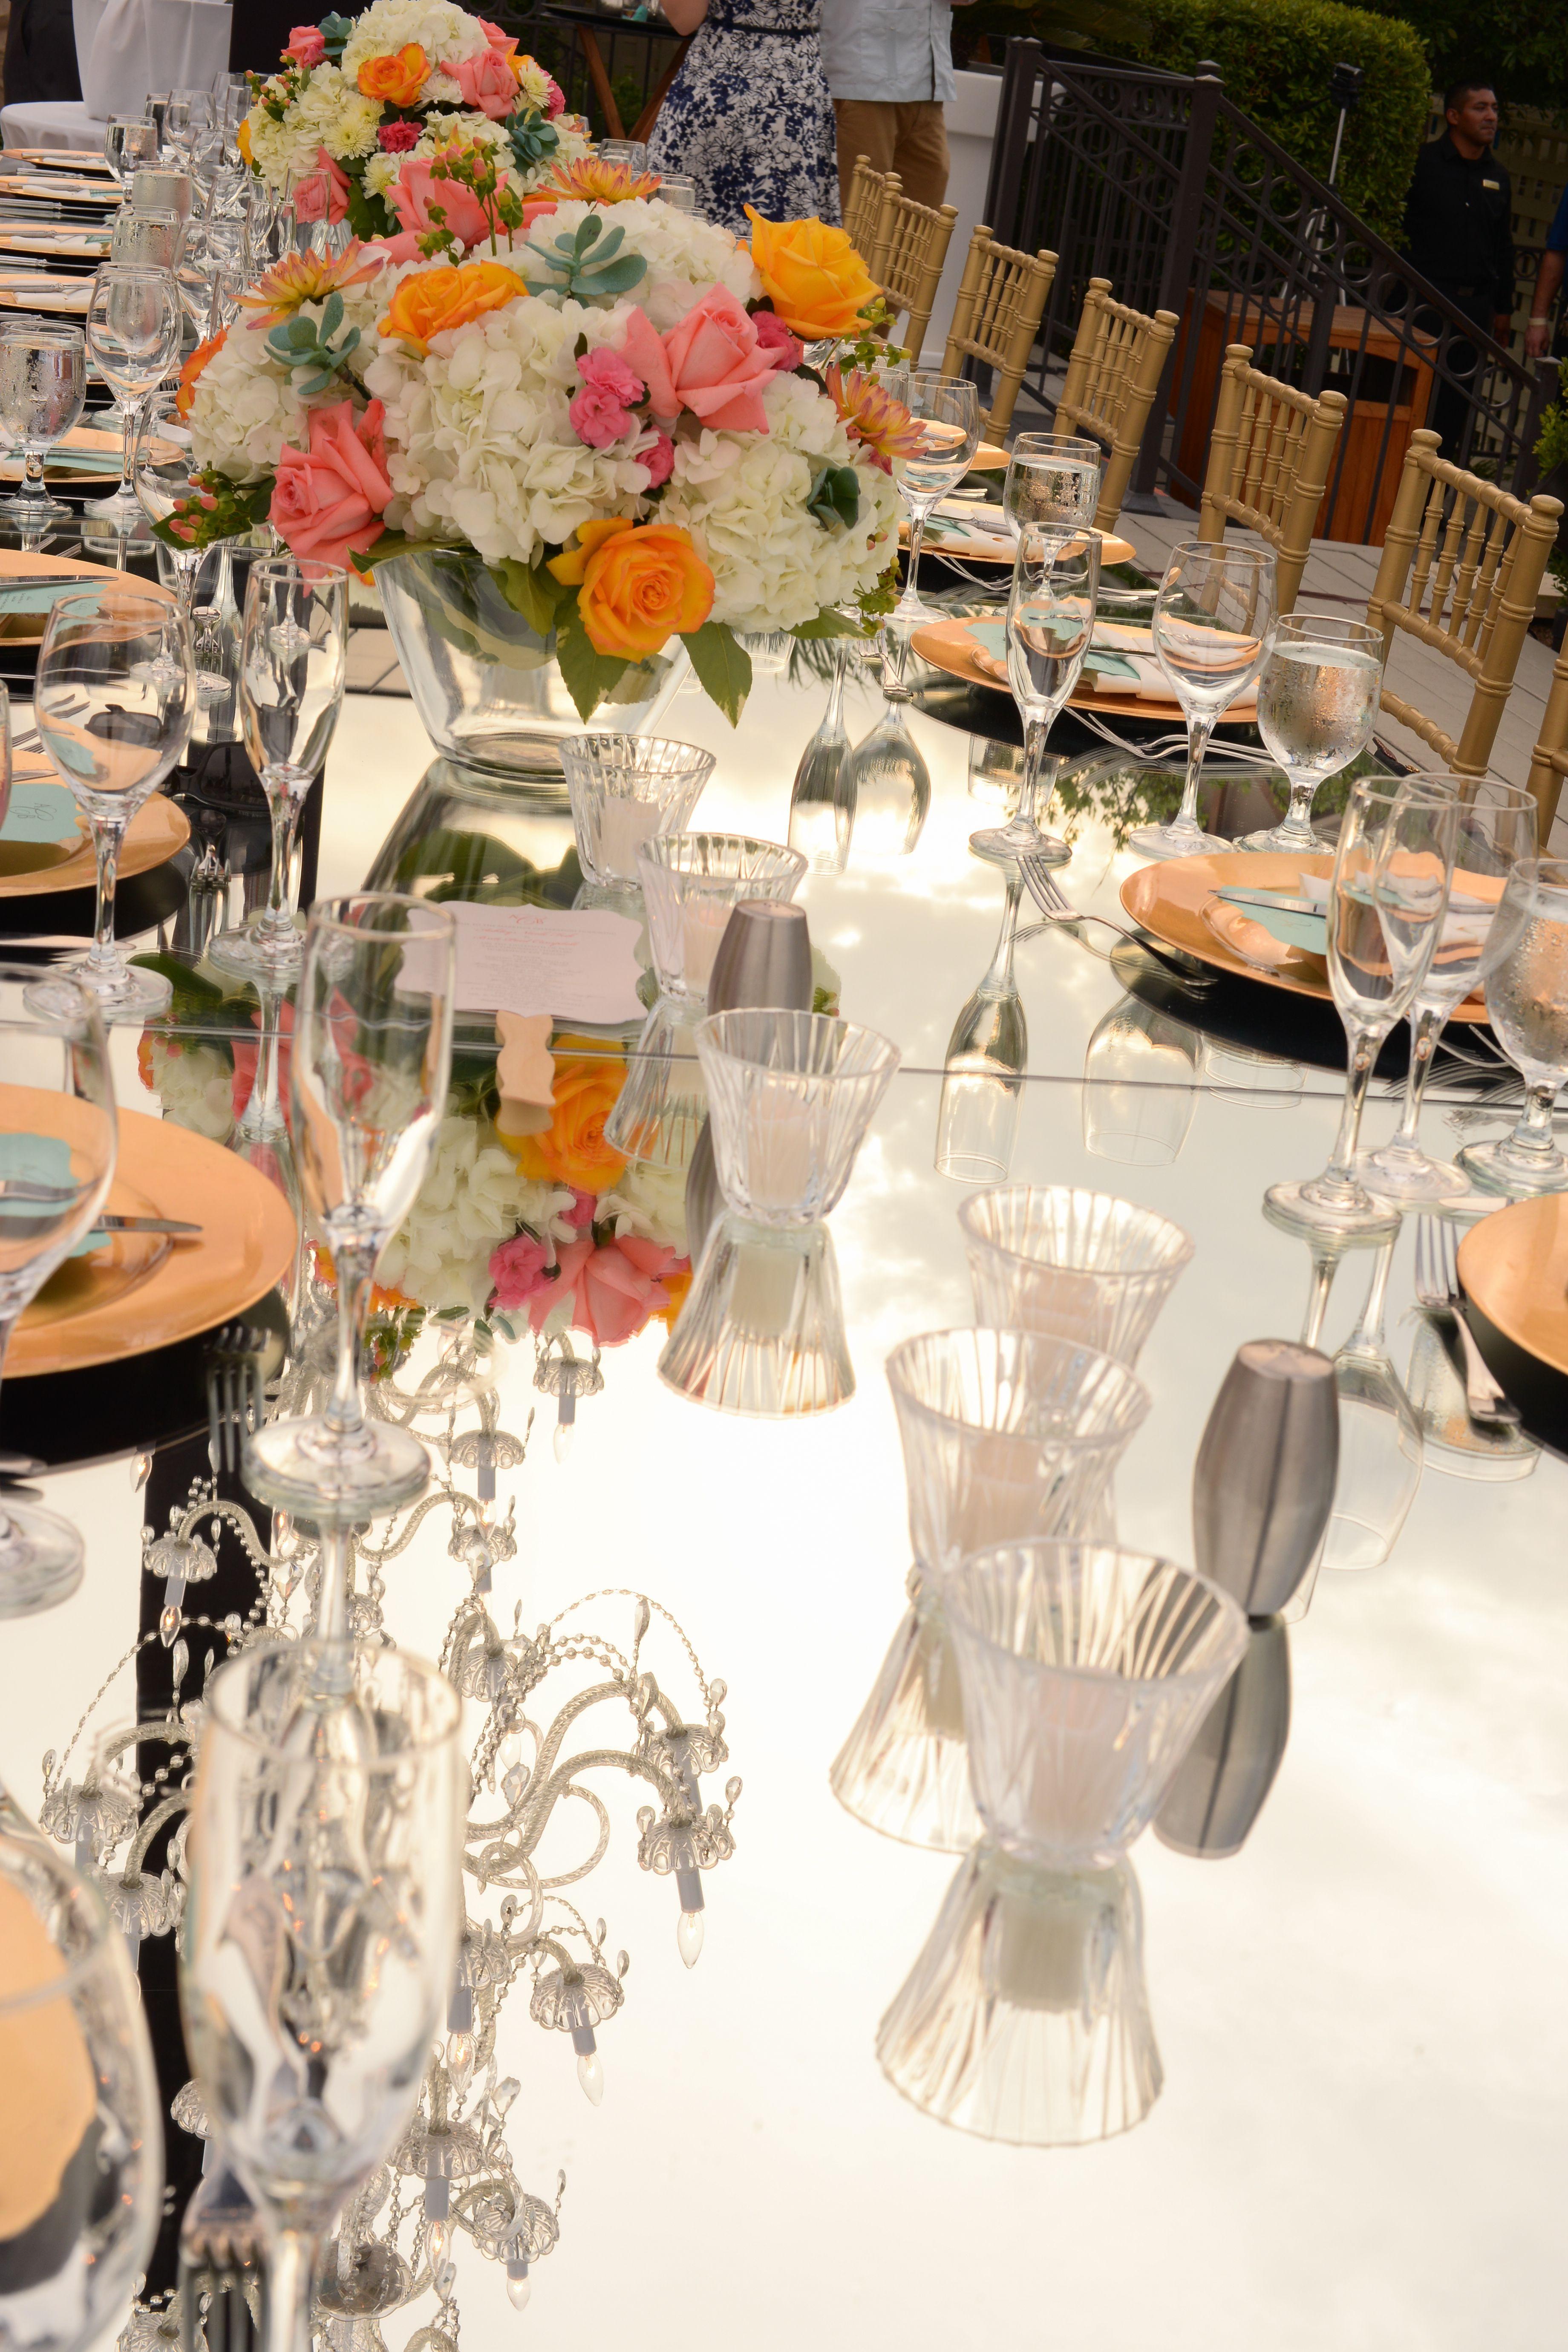 Mirrored Glass Table Top Decor DPC Event Services